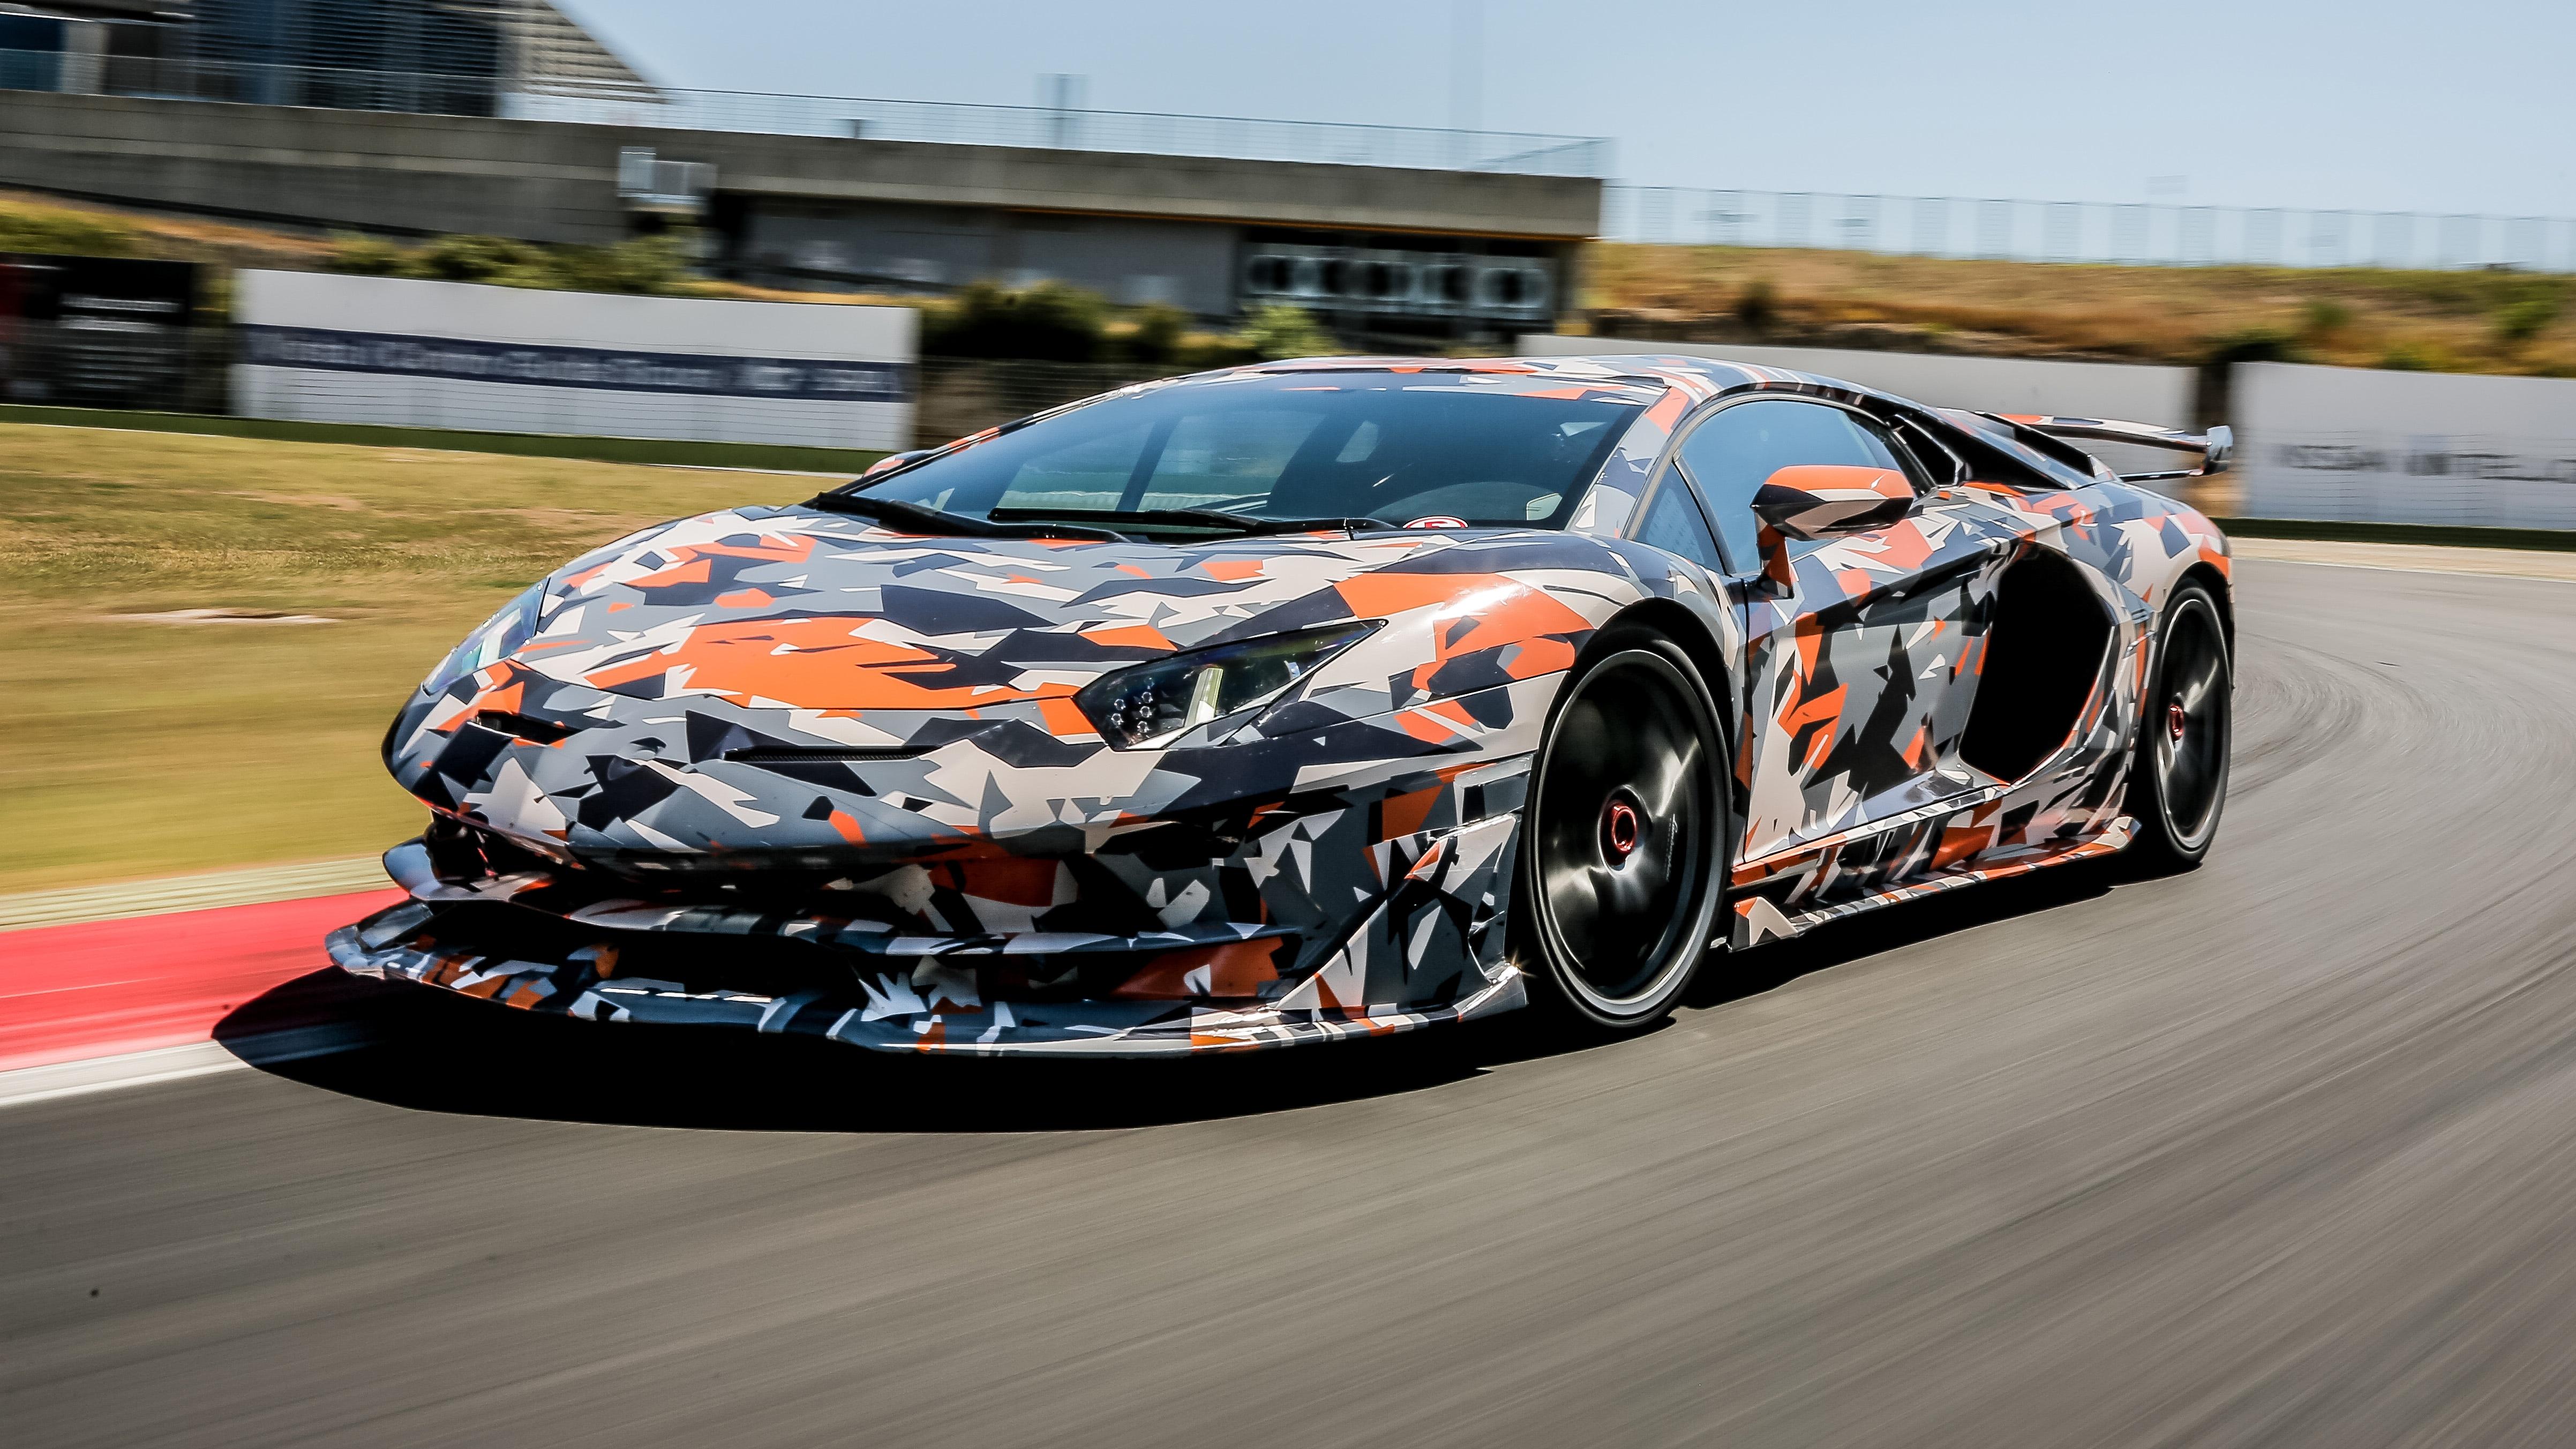 Lamborghini Aventador SVJ 2018, HD Cars, 4k Wallpapers ...